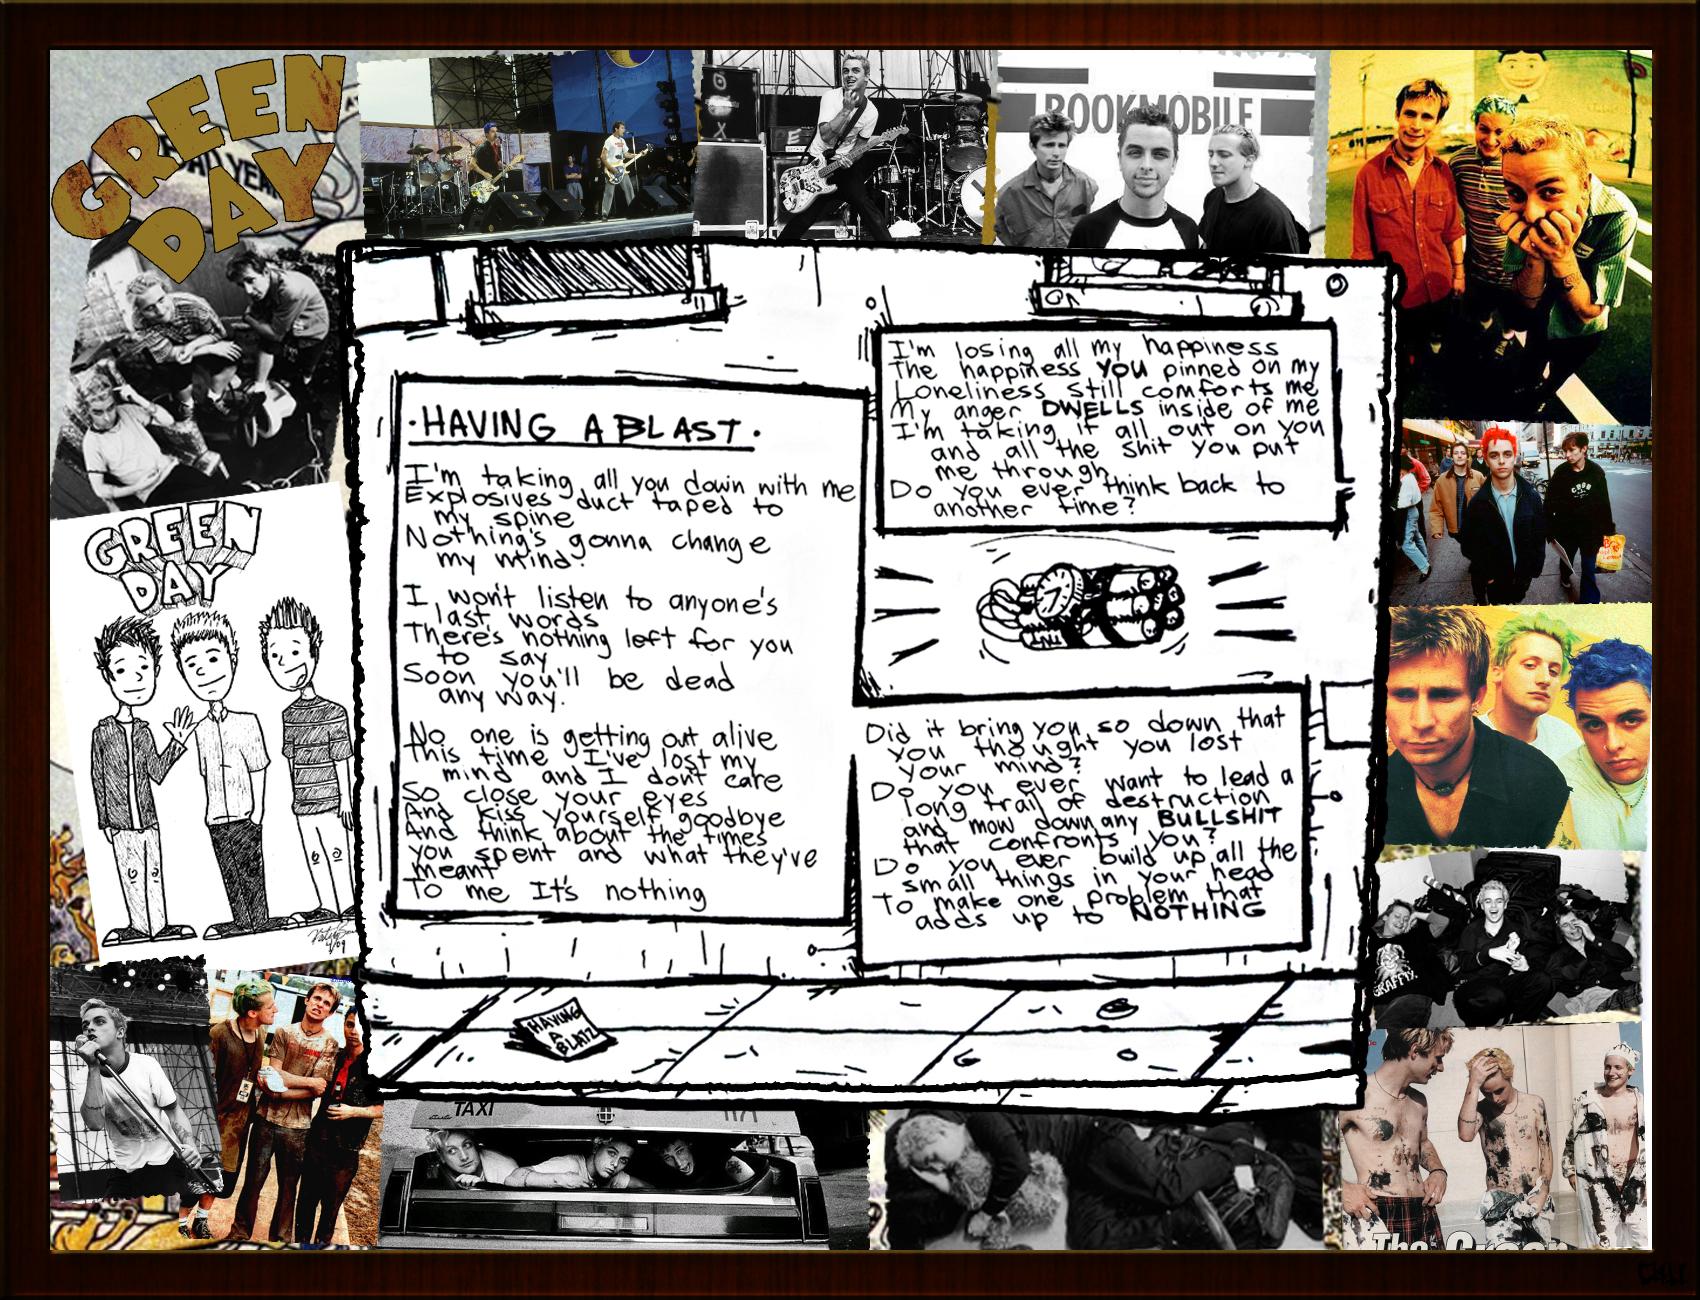 Dookie Wallpaper- Having A Blast